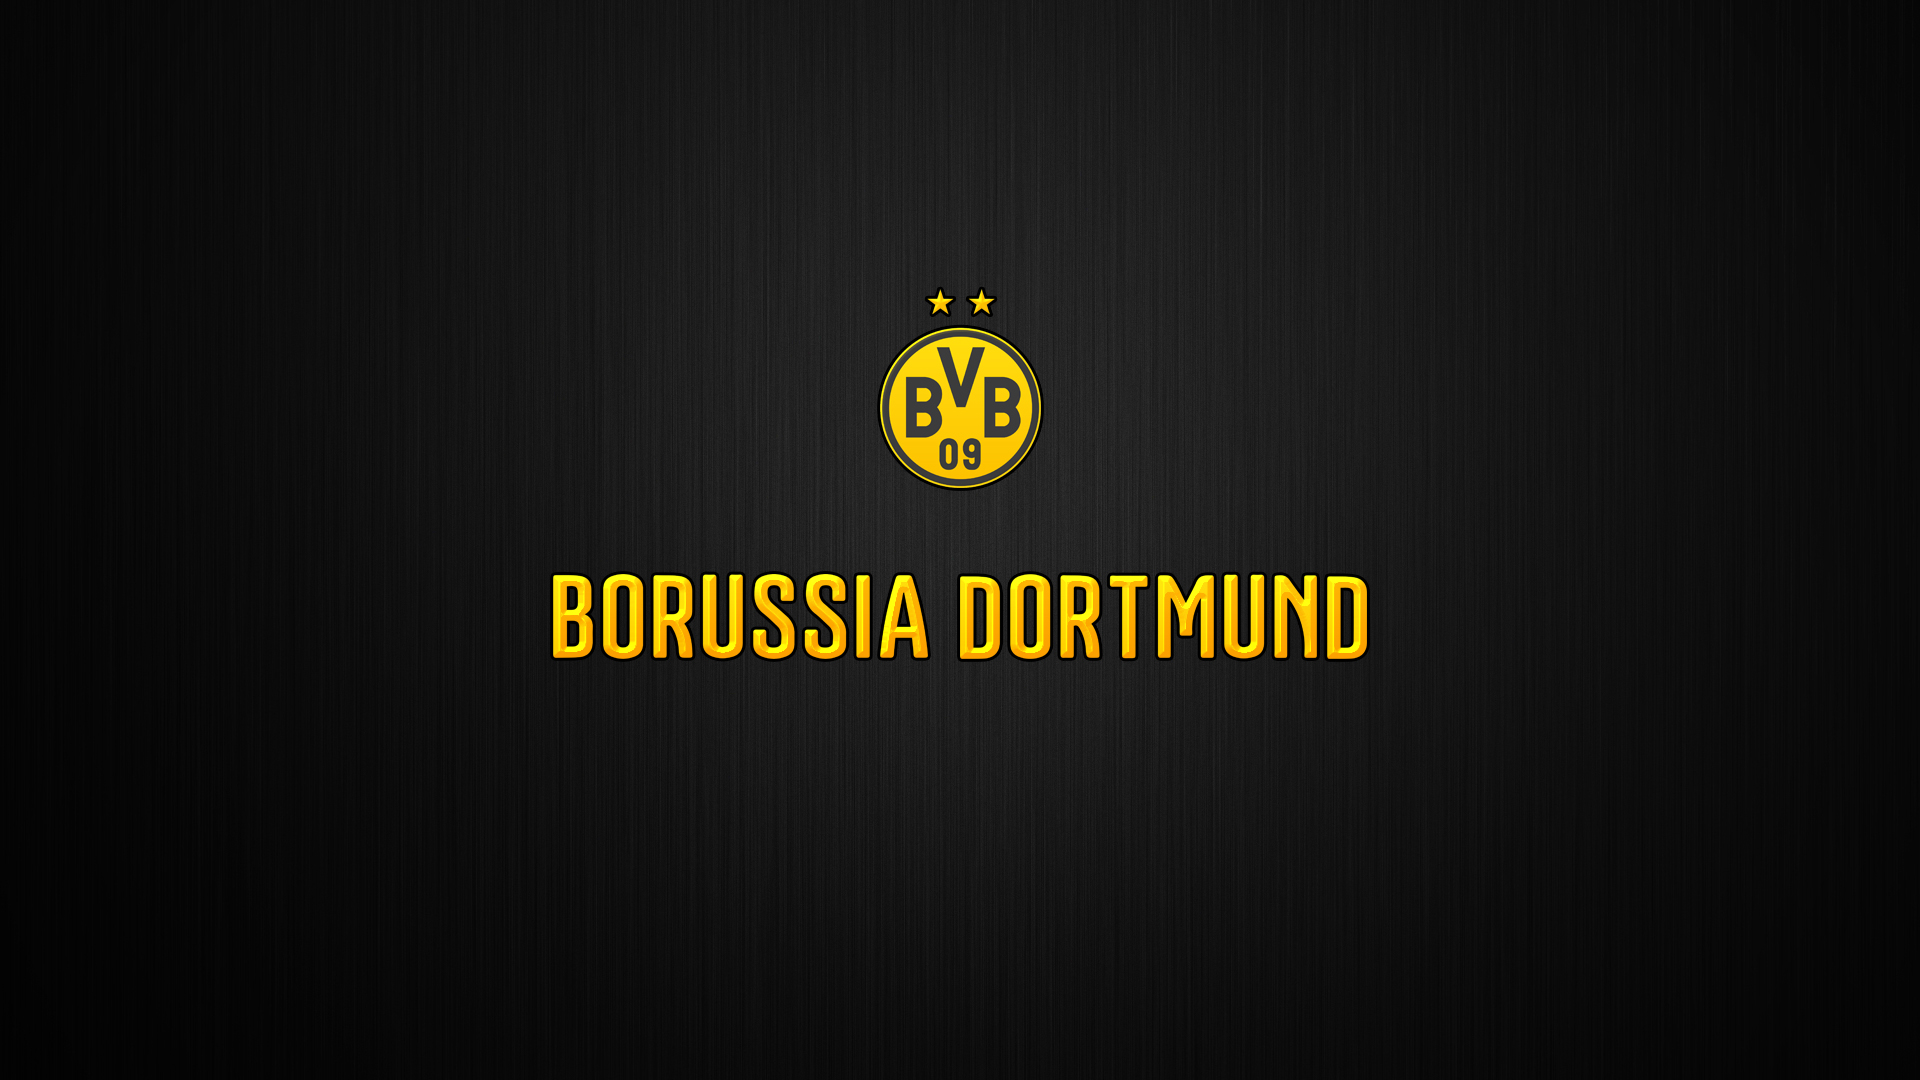 Borussia Dortmund Wallpaper 2014 15 By Pname On Deviantart